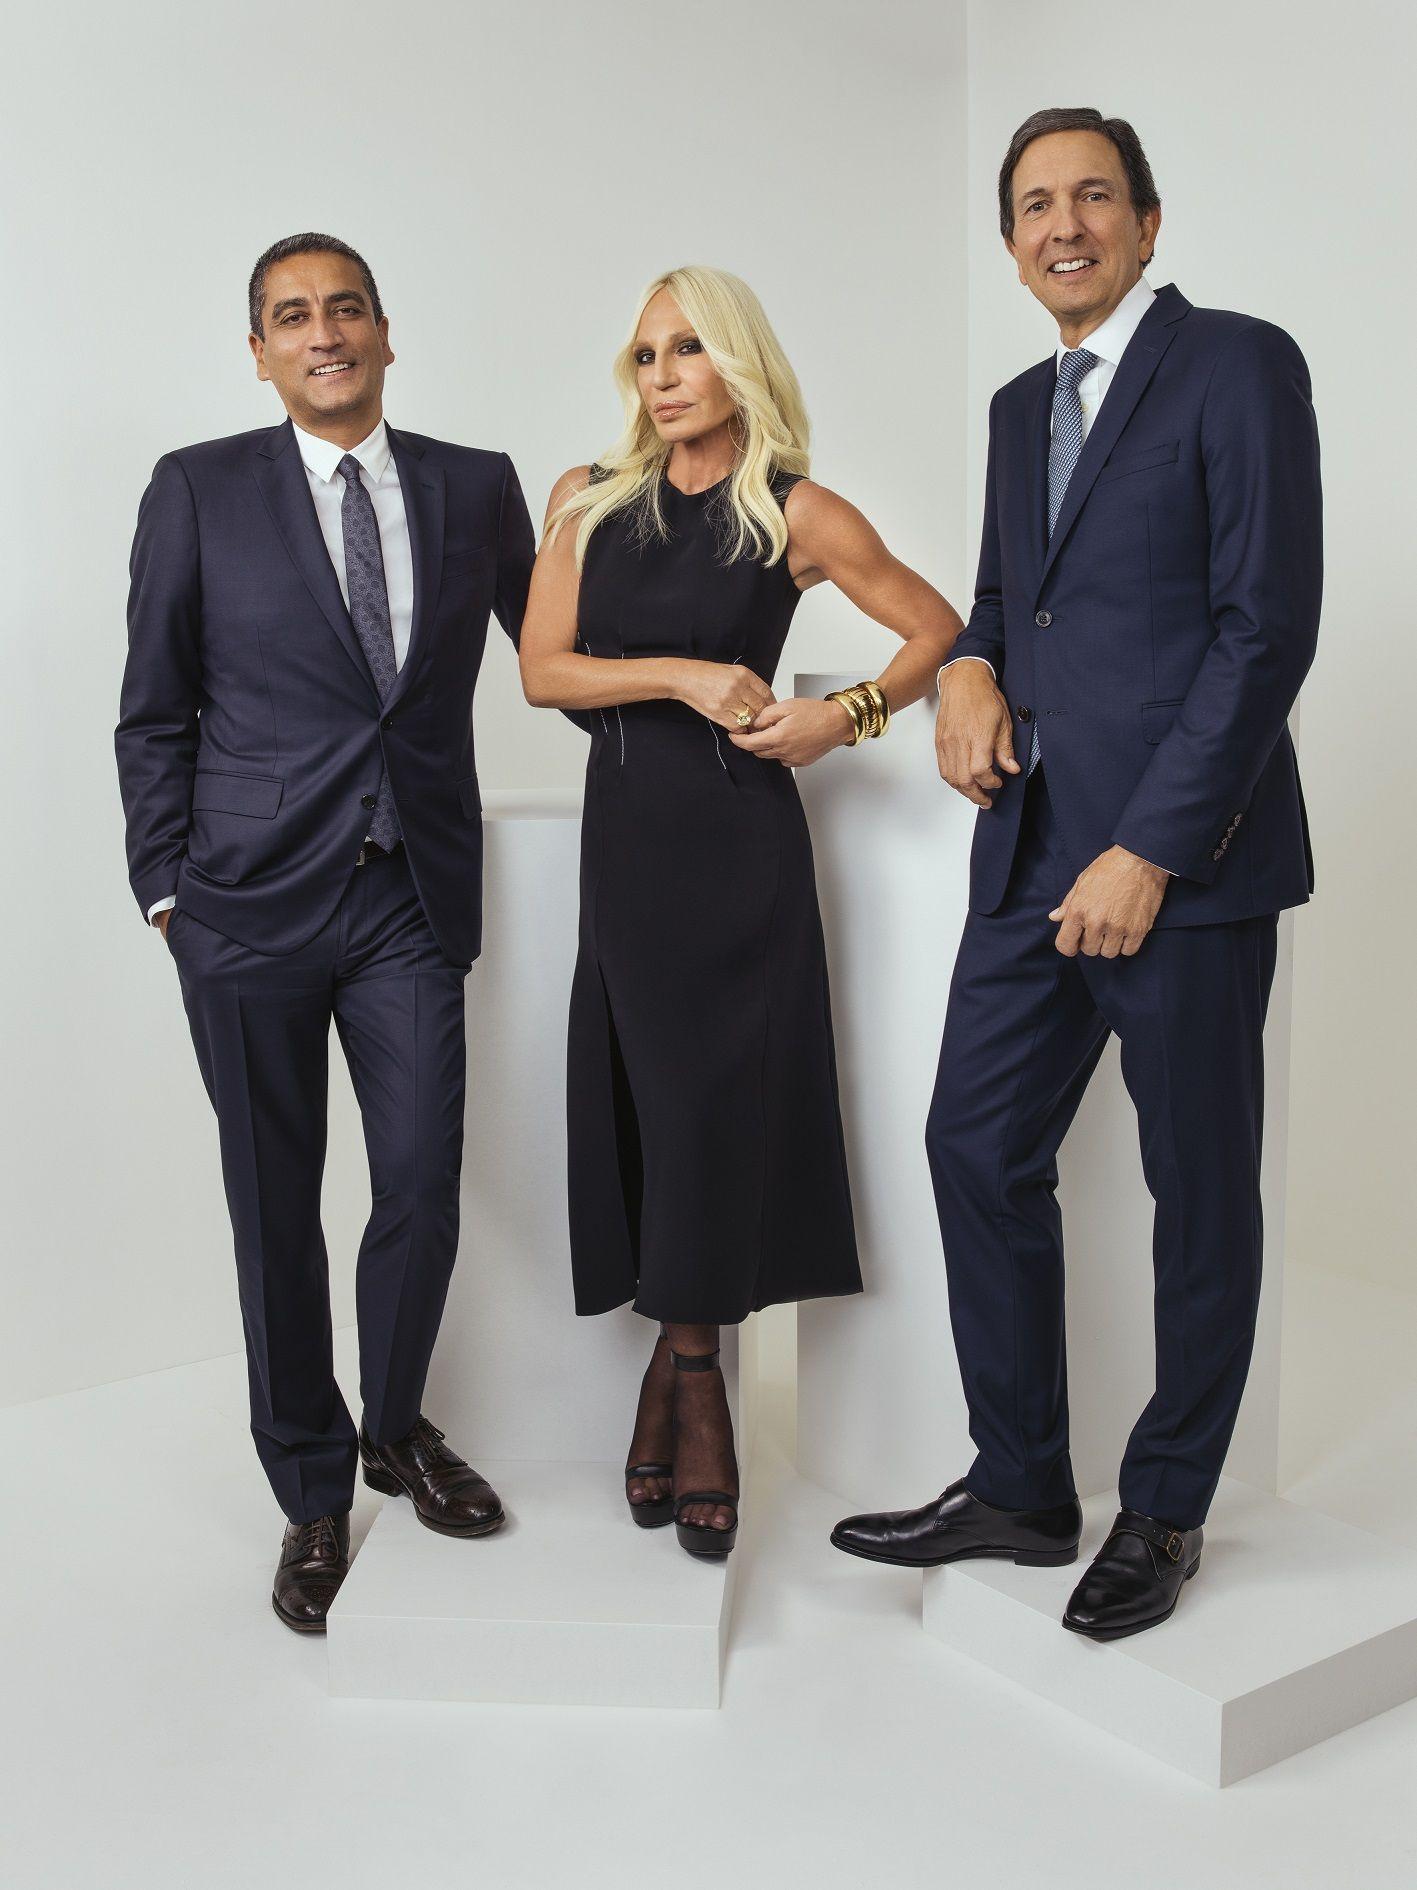 Michael Kors Bags Versace For $2.1 BN